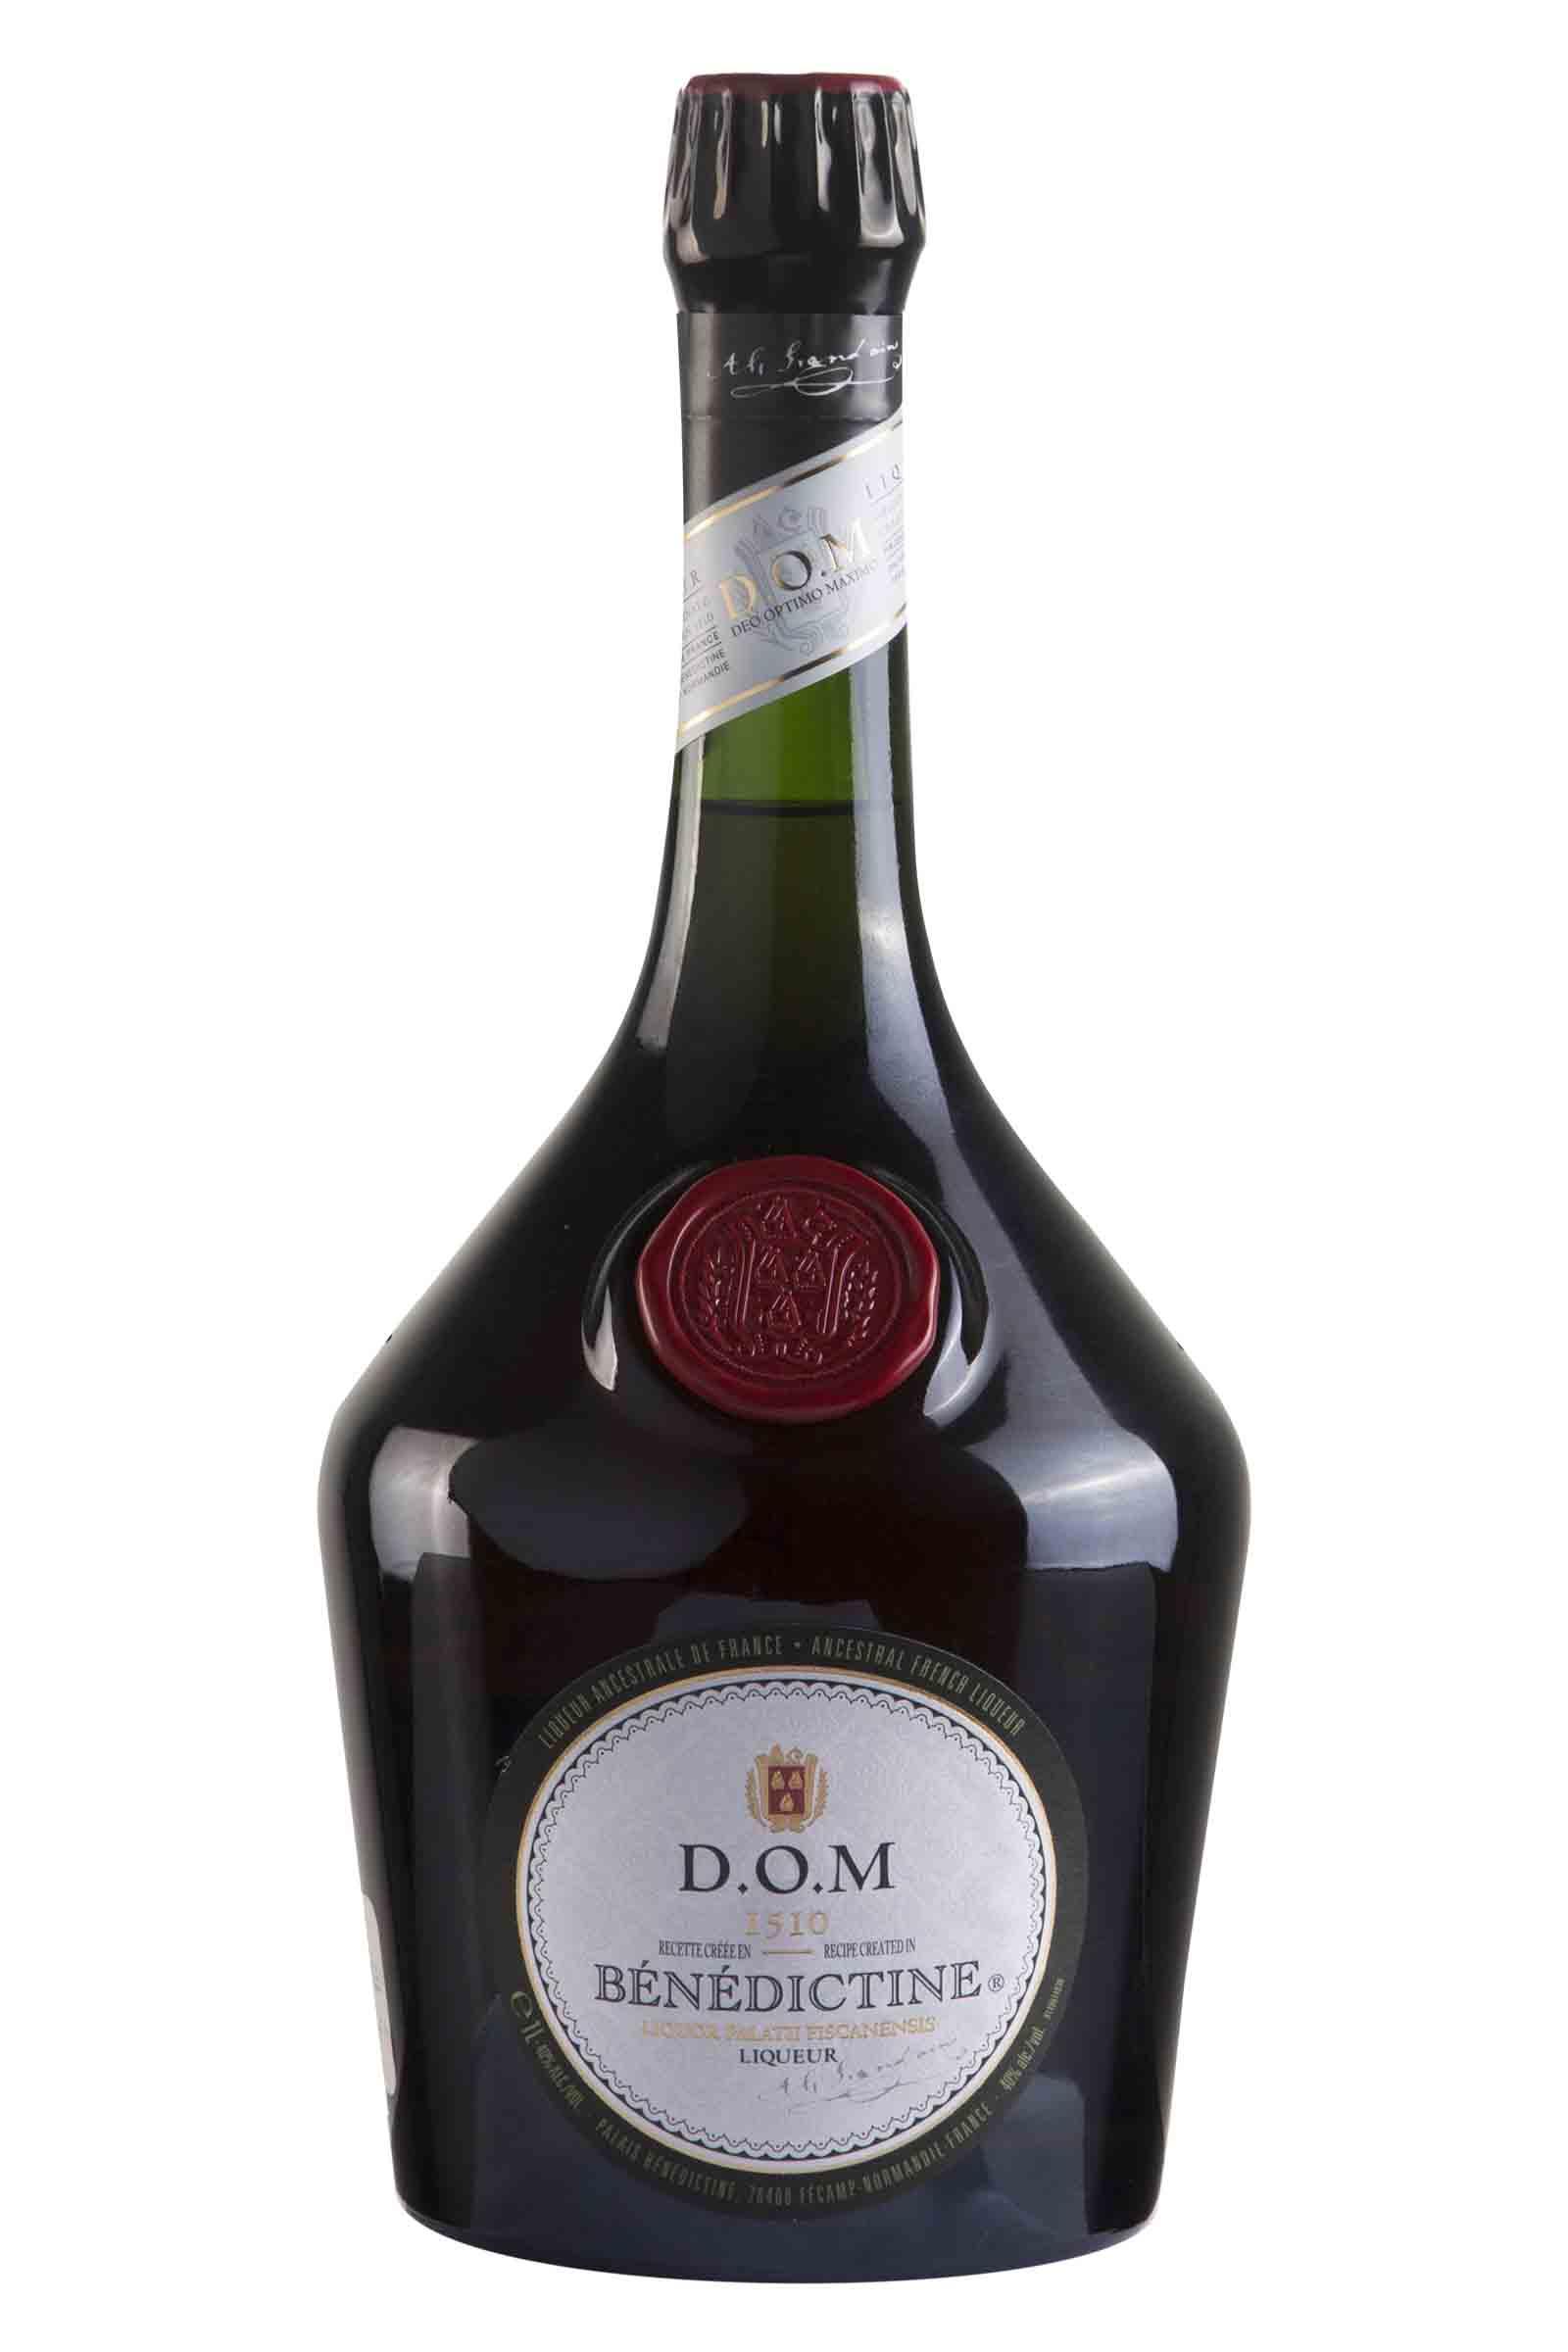 Bénédictine D.O.M. Liqueur 1000ml